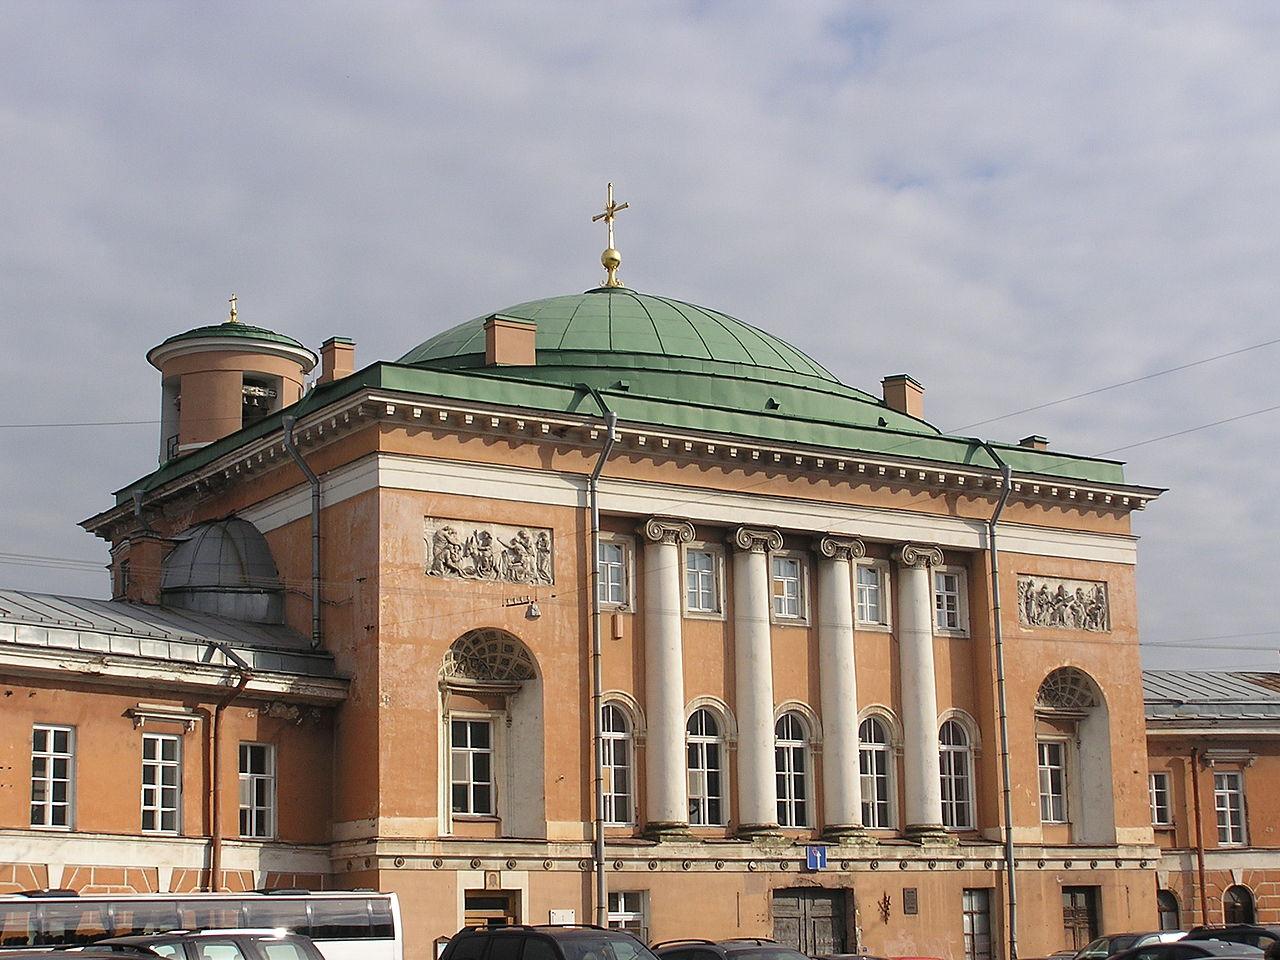 Спасо-Конюшенная церковь, источник фото: Wikimedia Commons, Автор: Andrew Butko